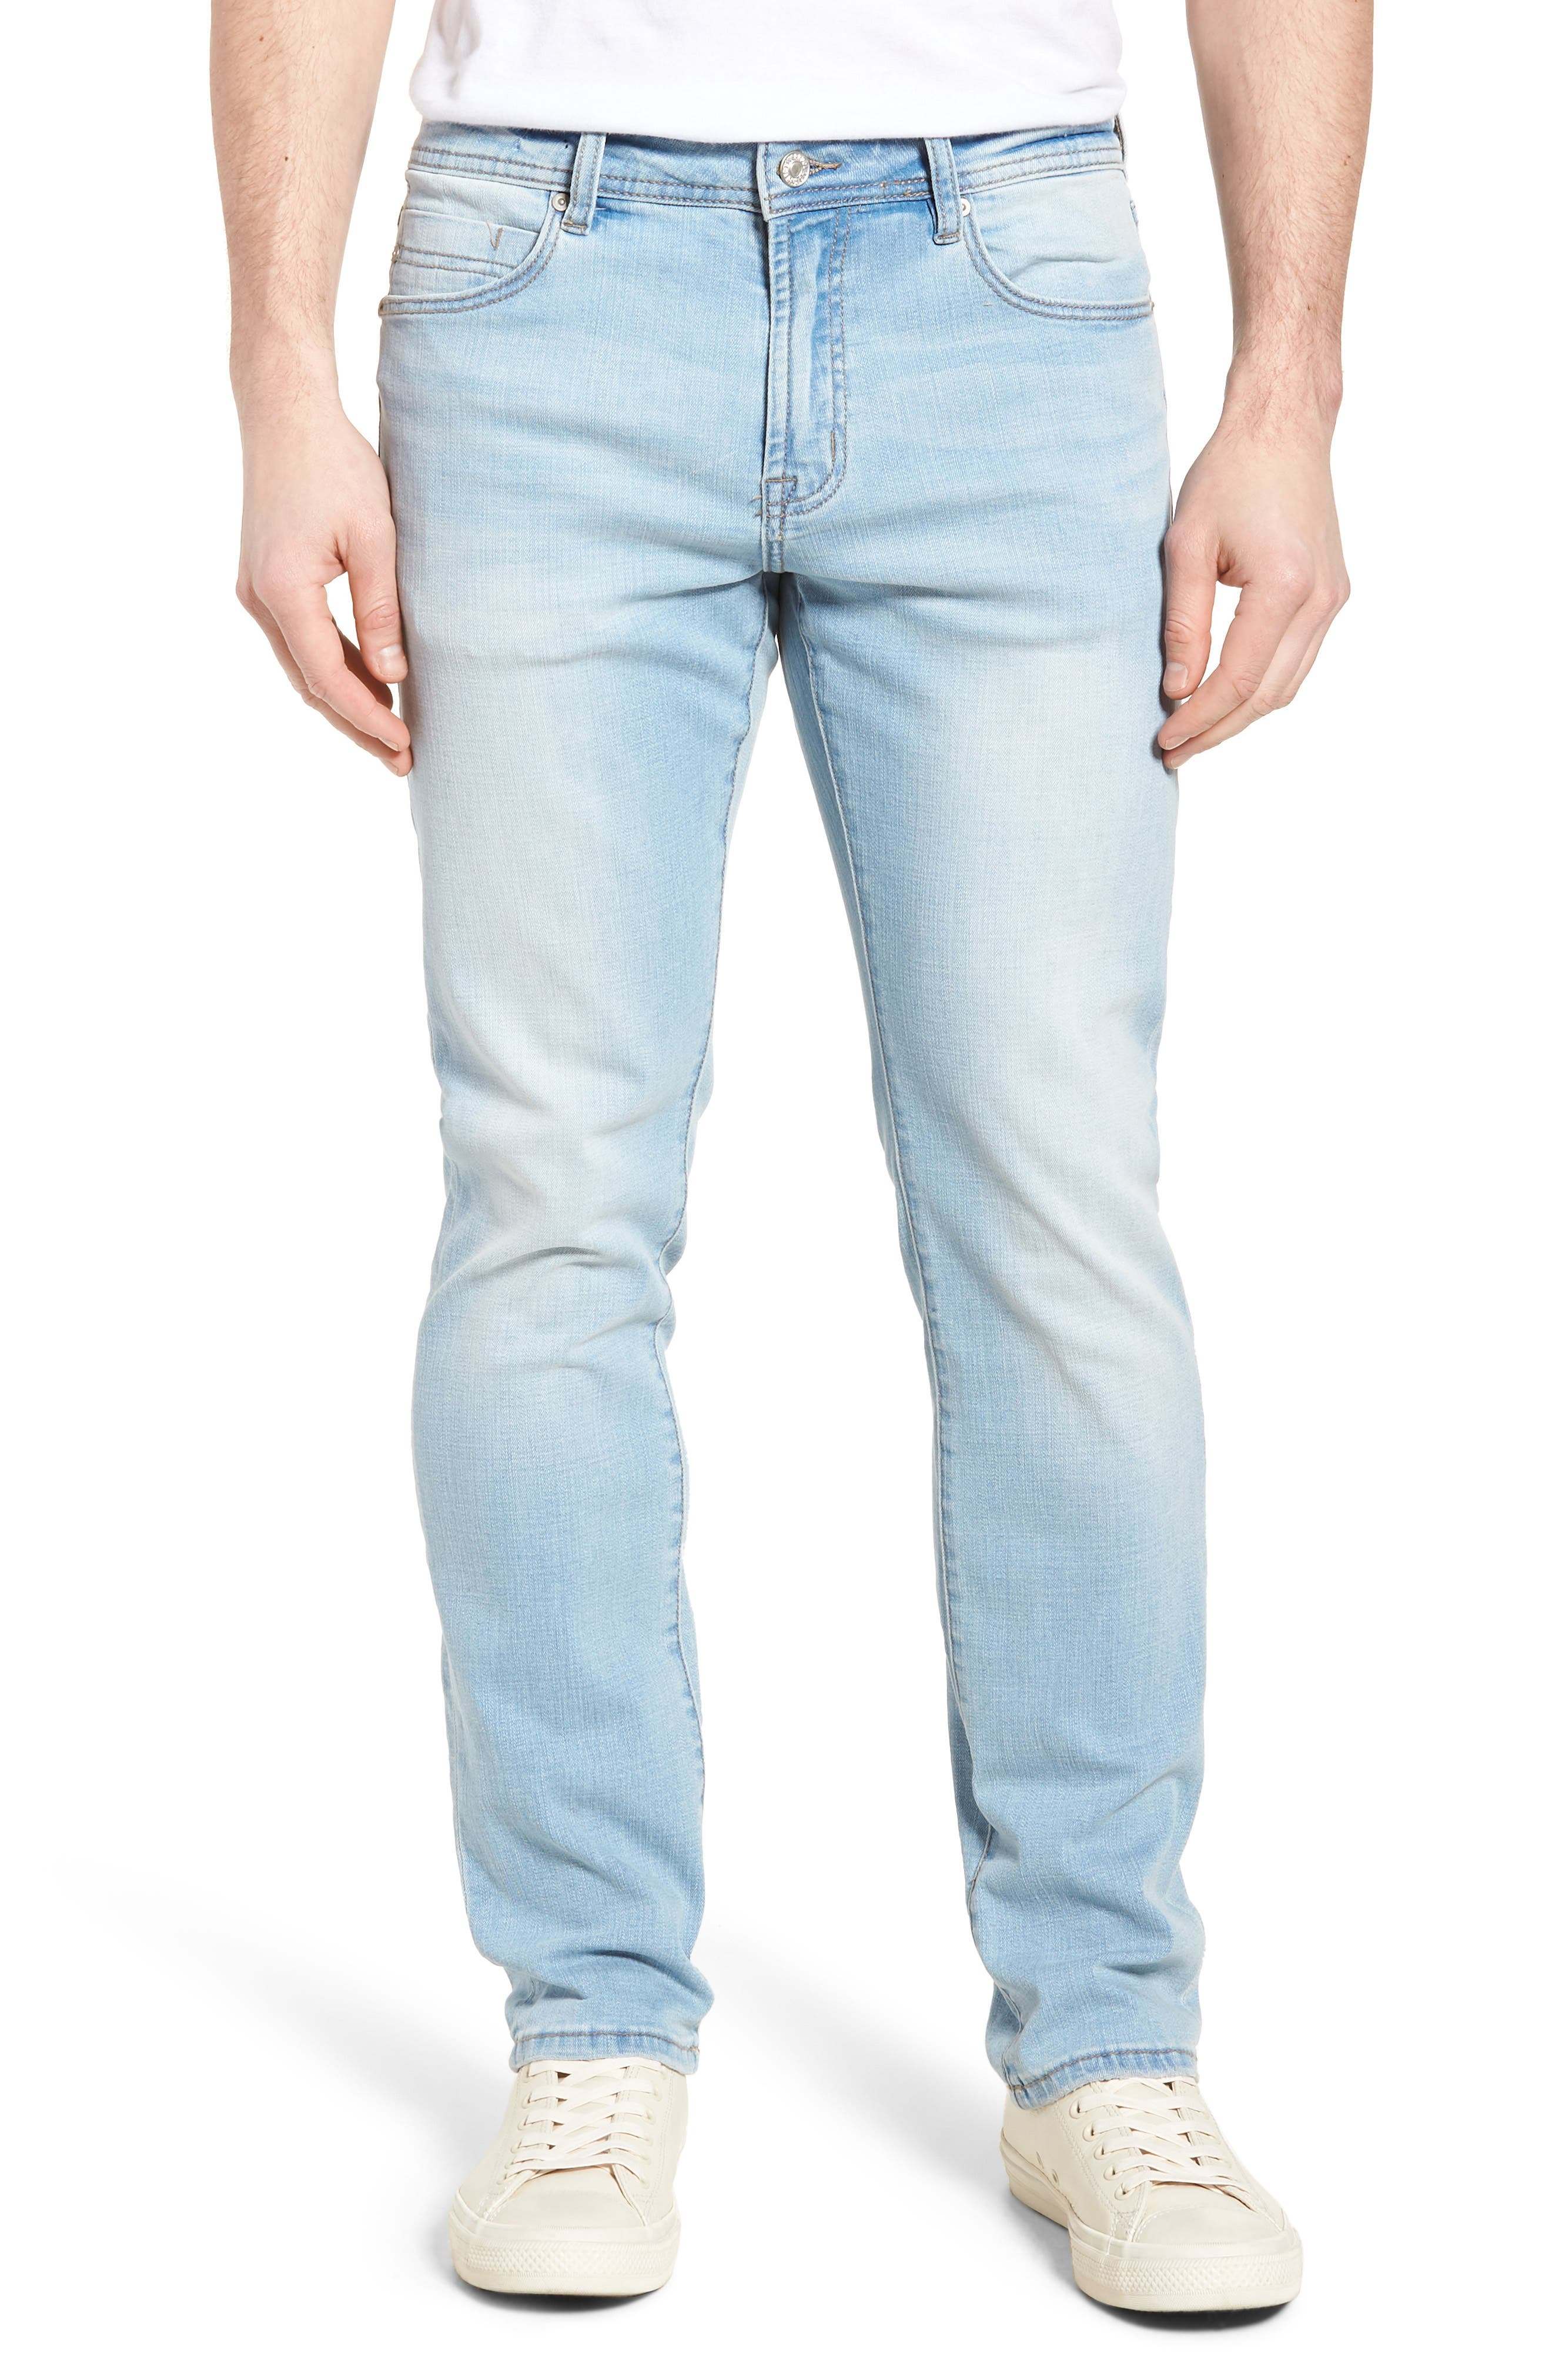 Liverpool Jeans Co. Straight Leg Jeans (Riverside Light)